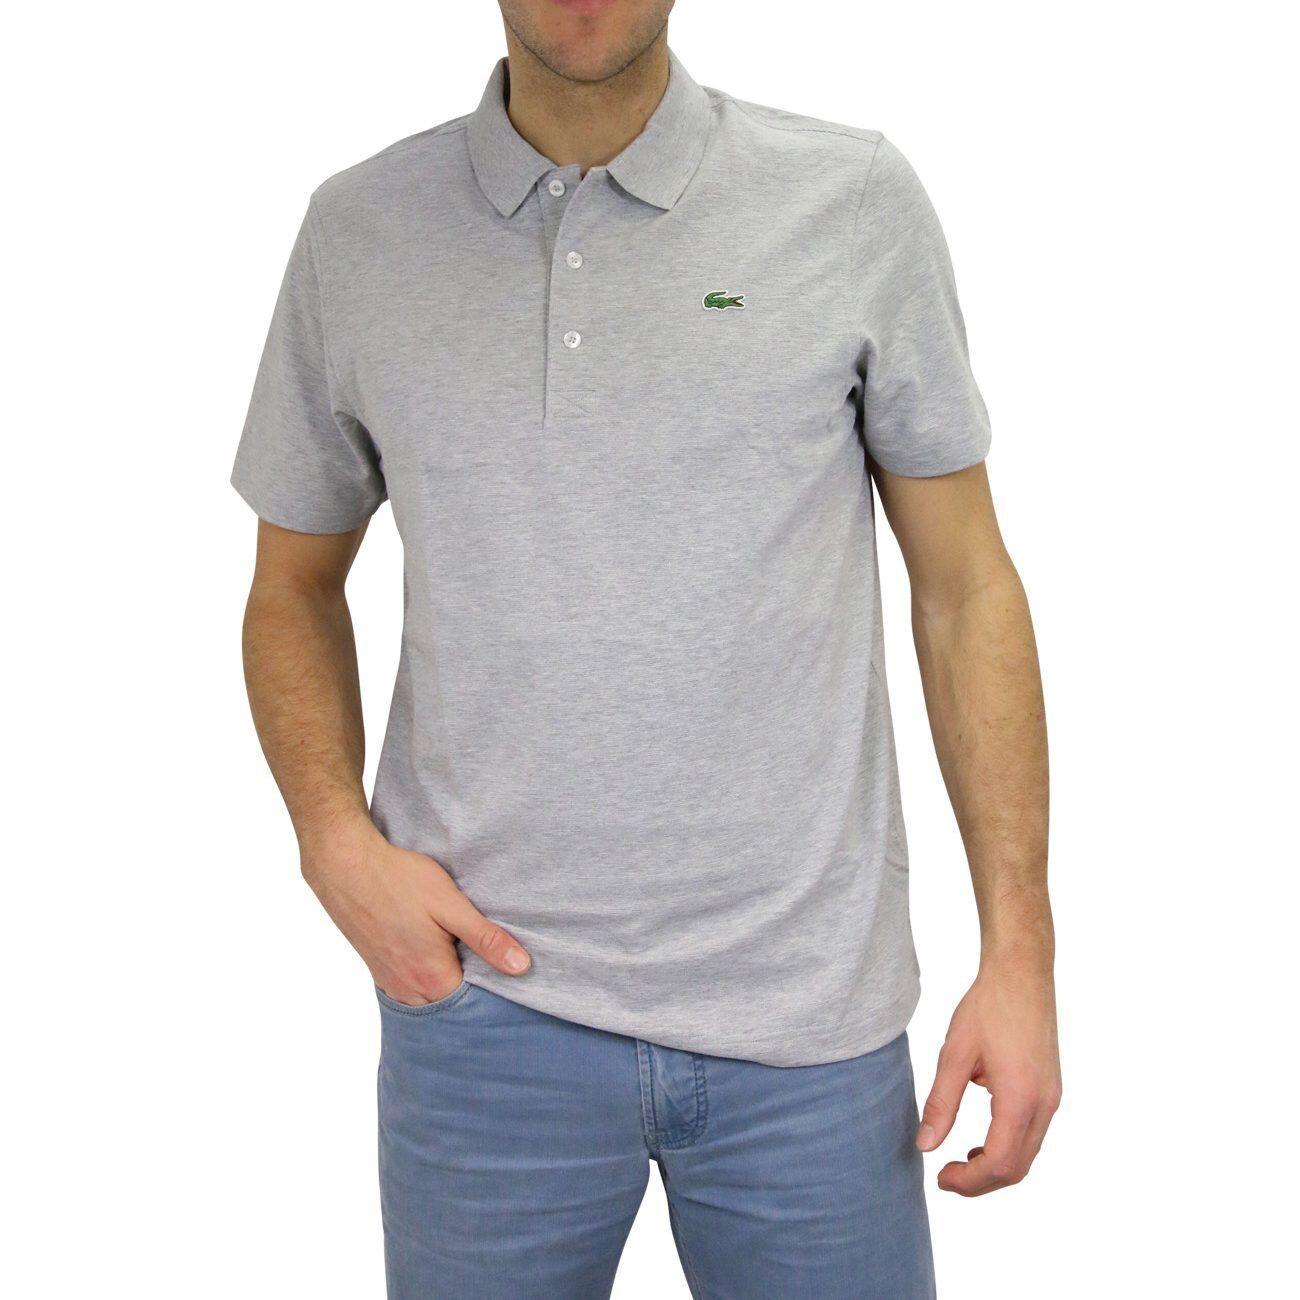 Lacoste Regular Fit Polo Poloshirt Polohemd Kurzarm Baumwolle Herren L1230 CCA